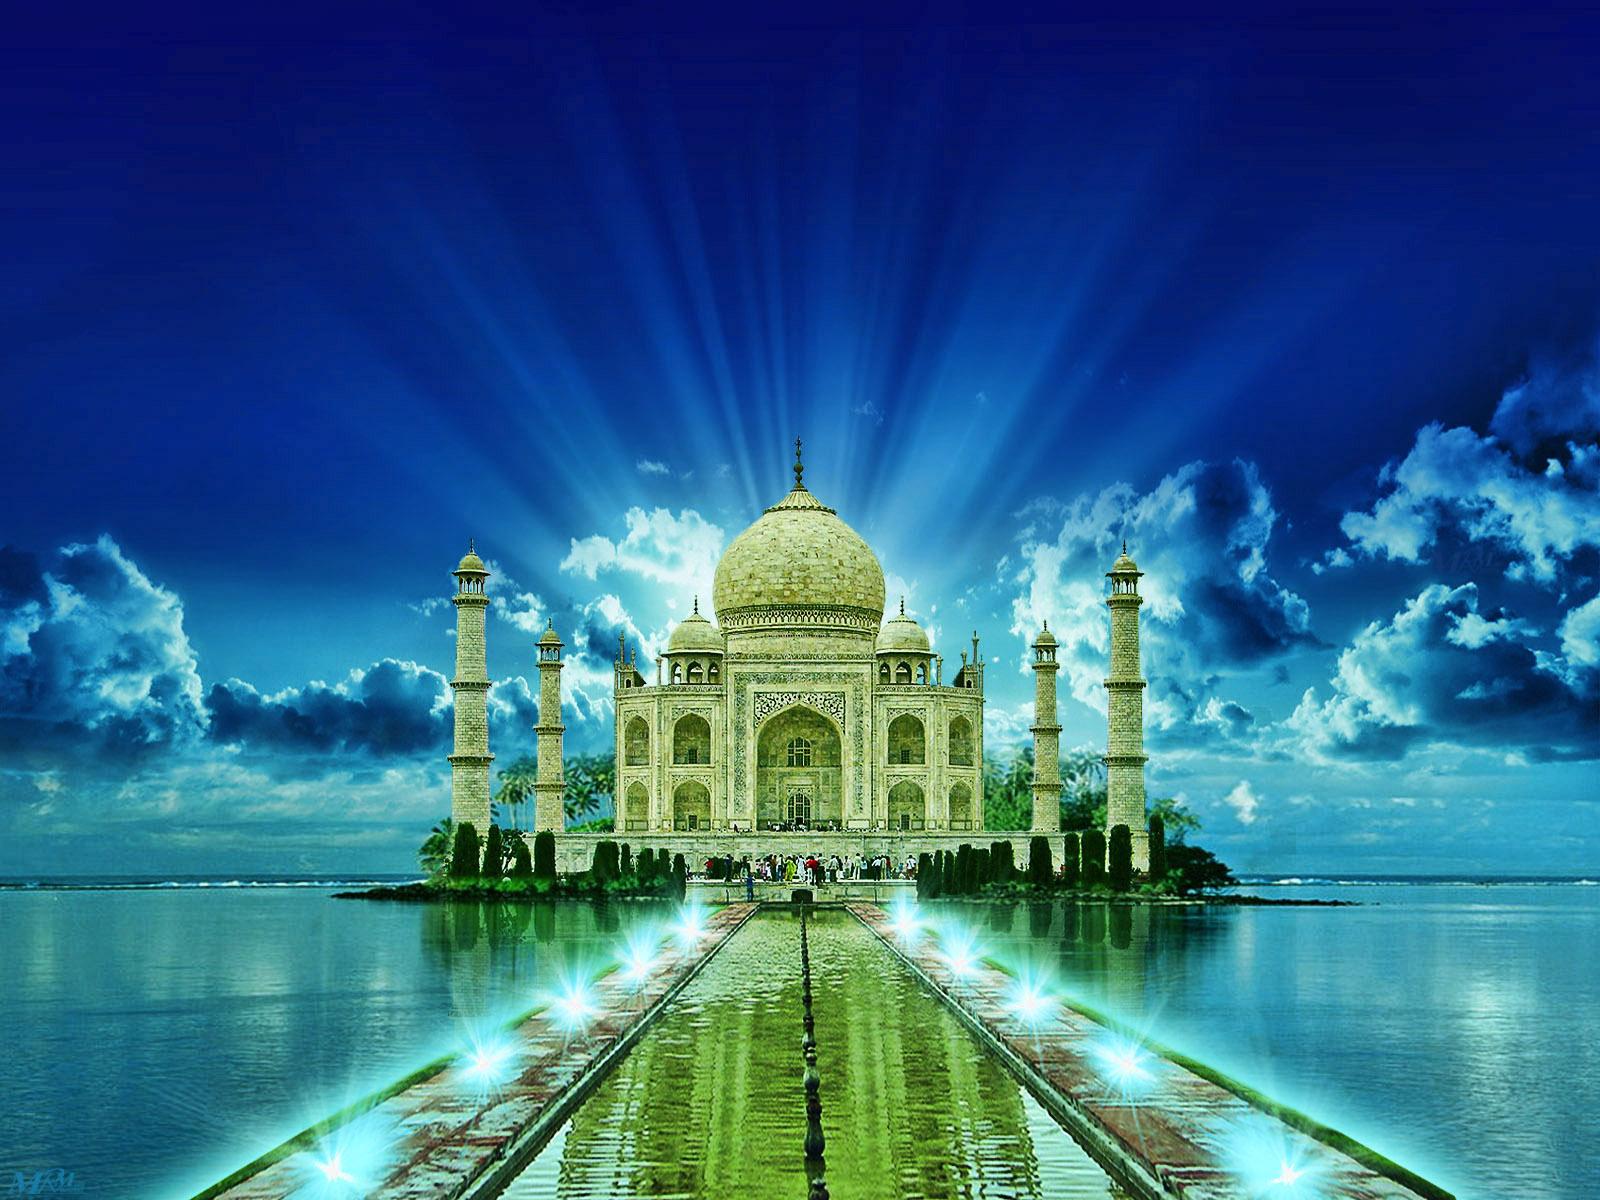 HD WALLPAPER GALLERY Taj Mahal India wallpaper 1600x1200